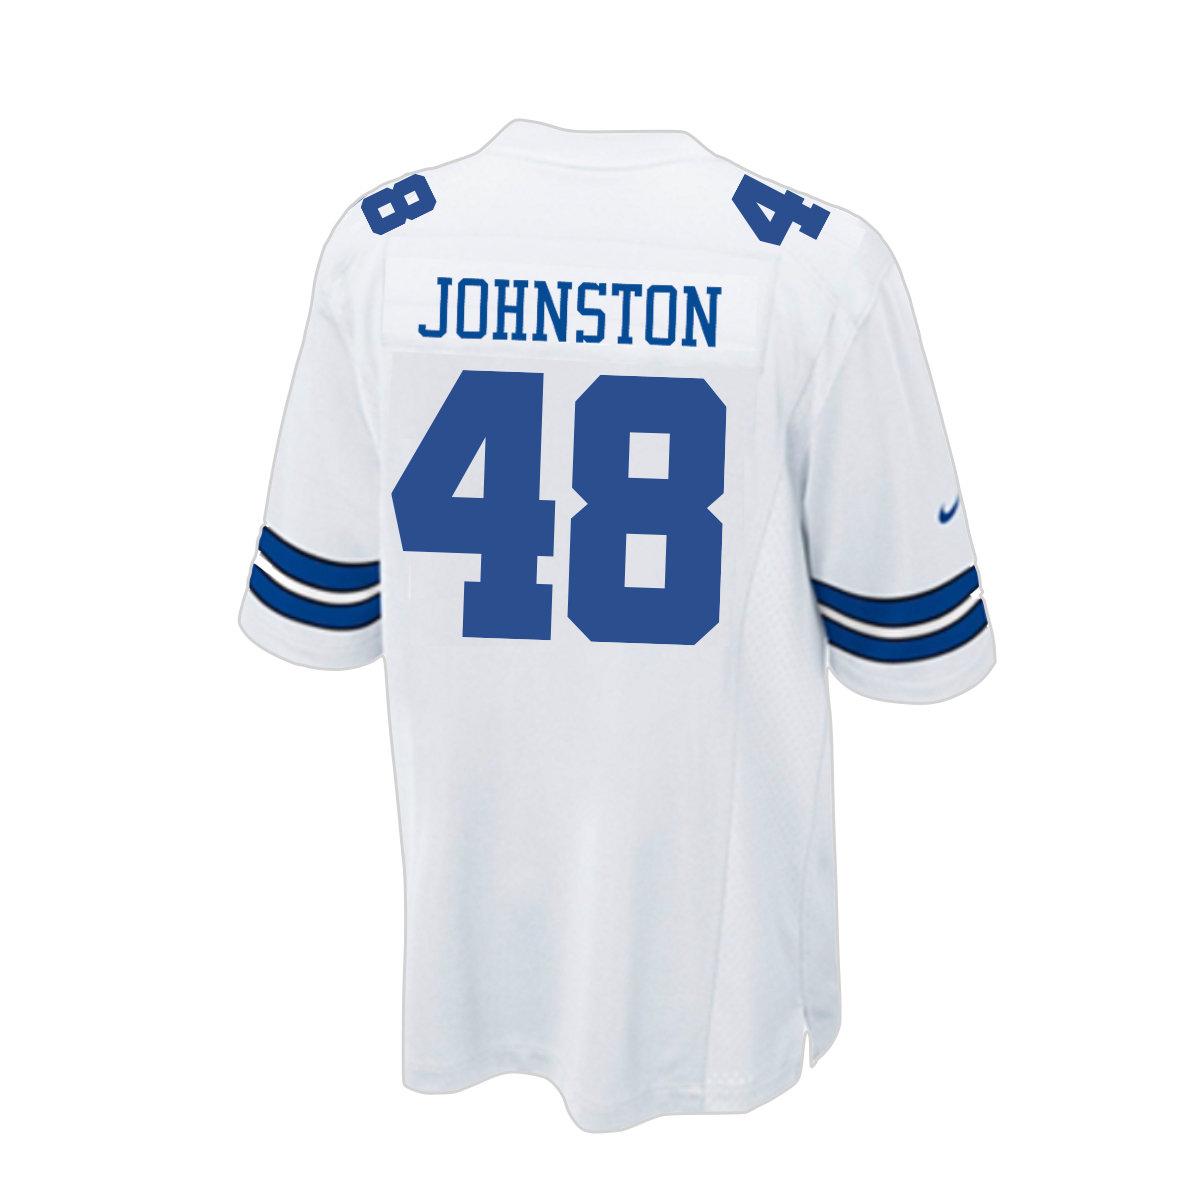 Daryl Johnston Nike Game Replica Jersey | Cowboys Legends